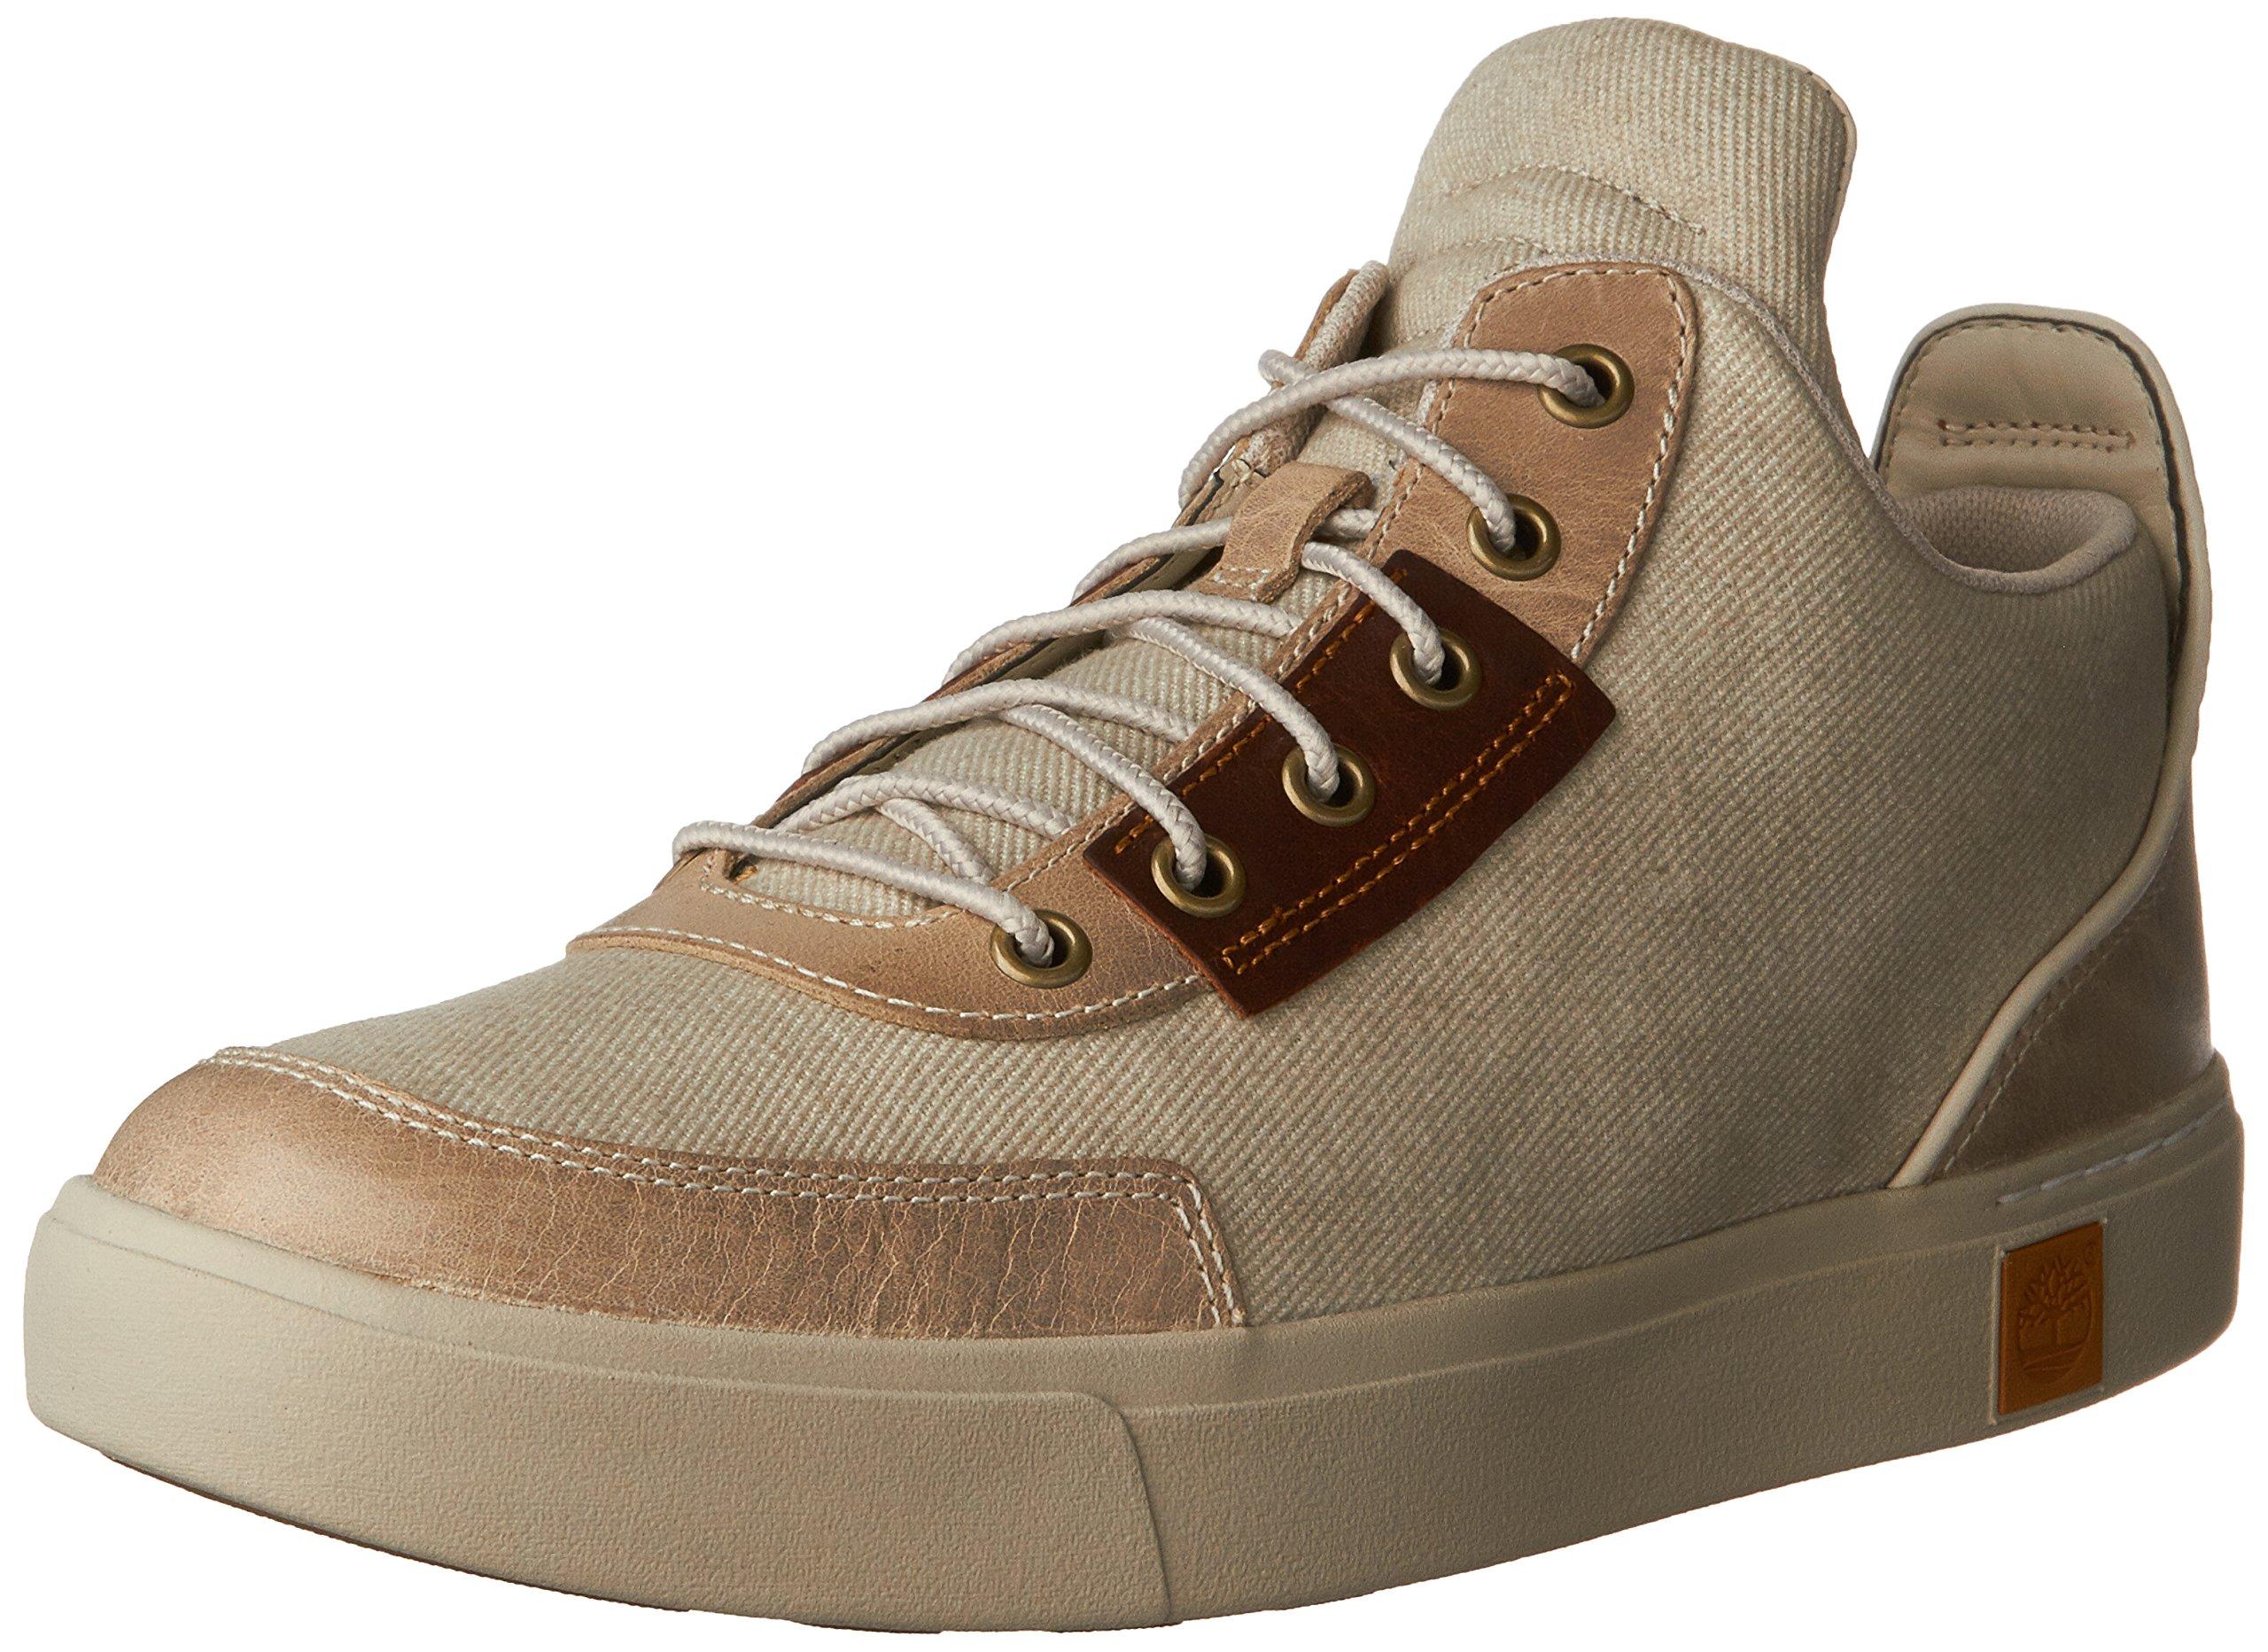 Timberland Men's Amherst Chukka Fashion Sneaker, String Cotton Canvas, 9.5 W US